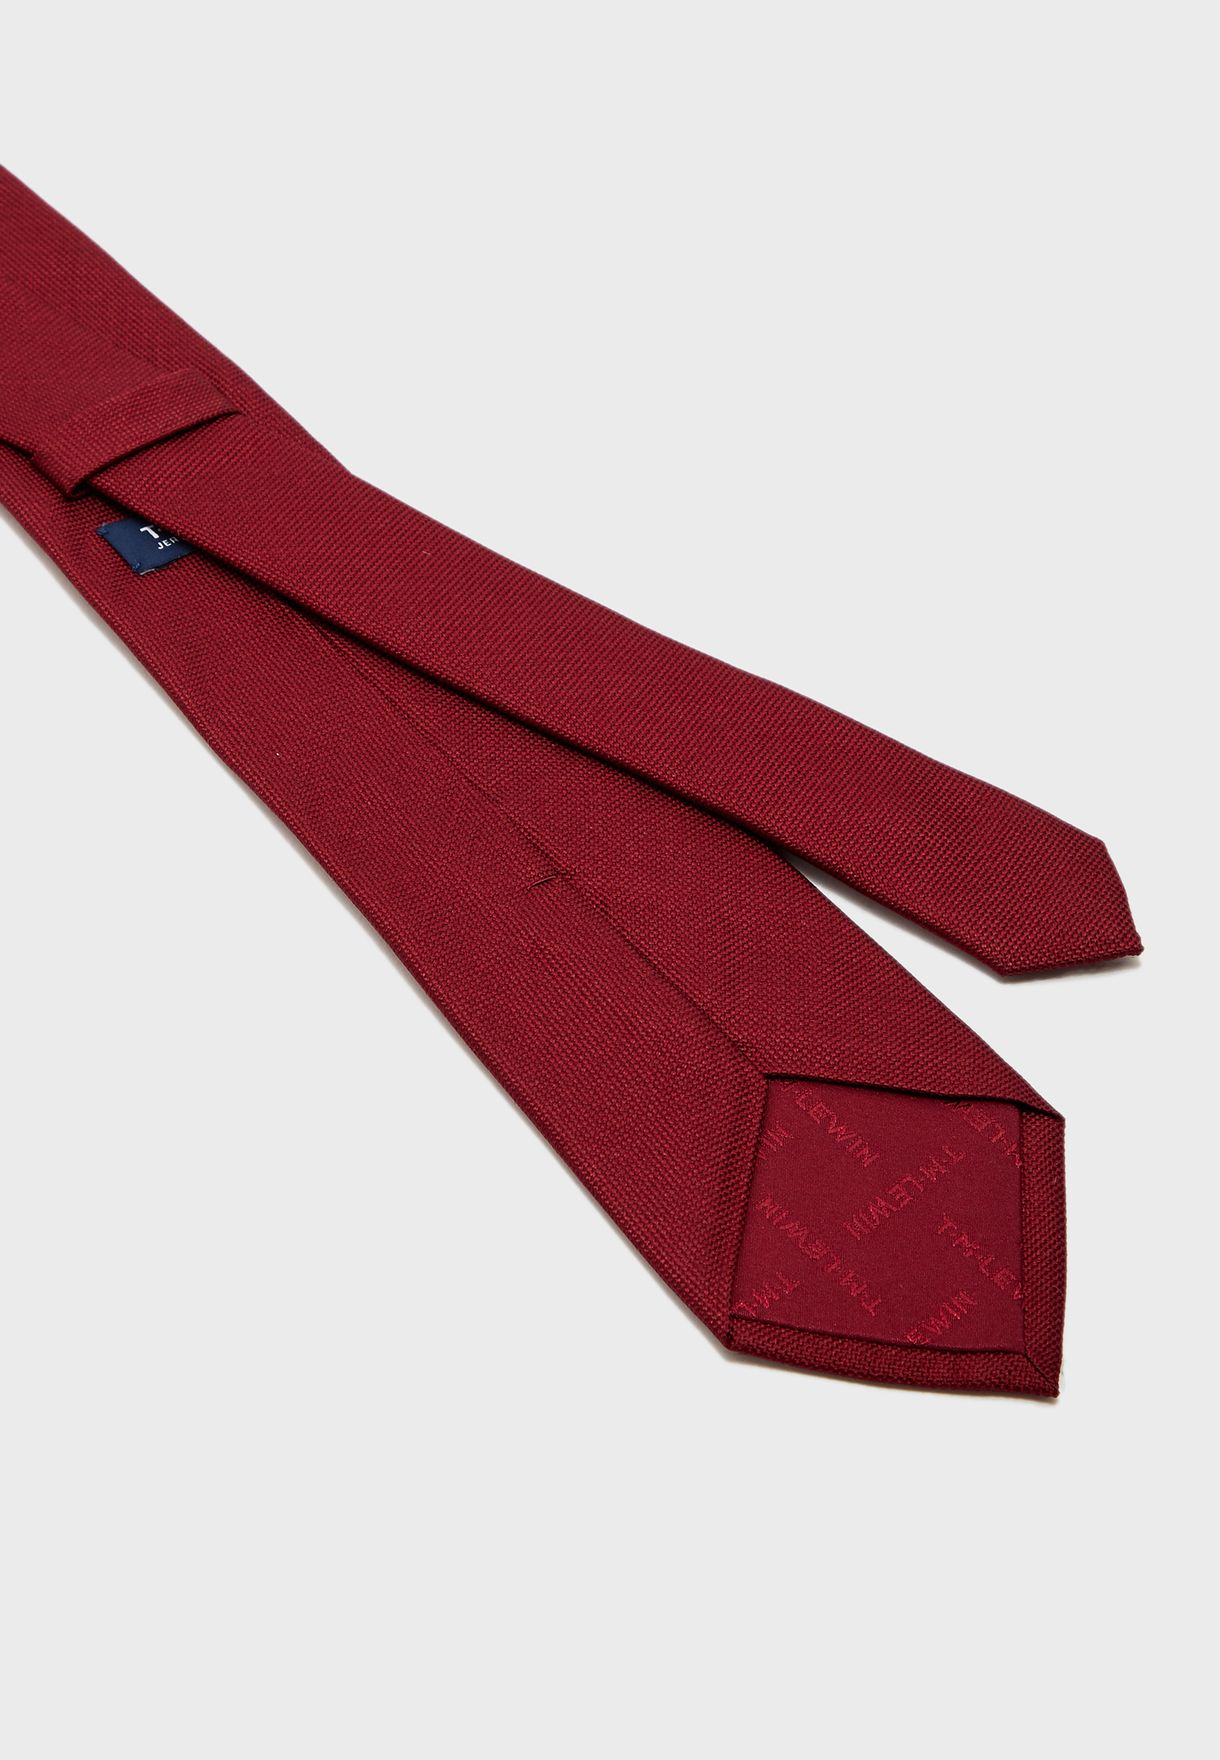 Plain Textured Weave Tie